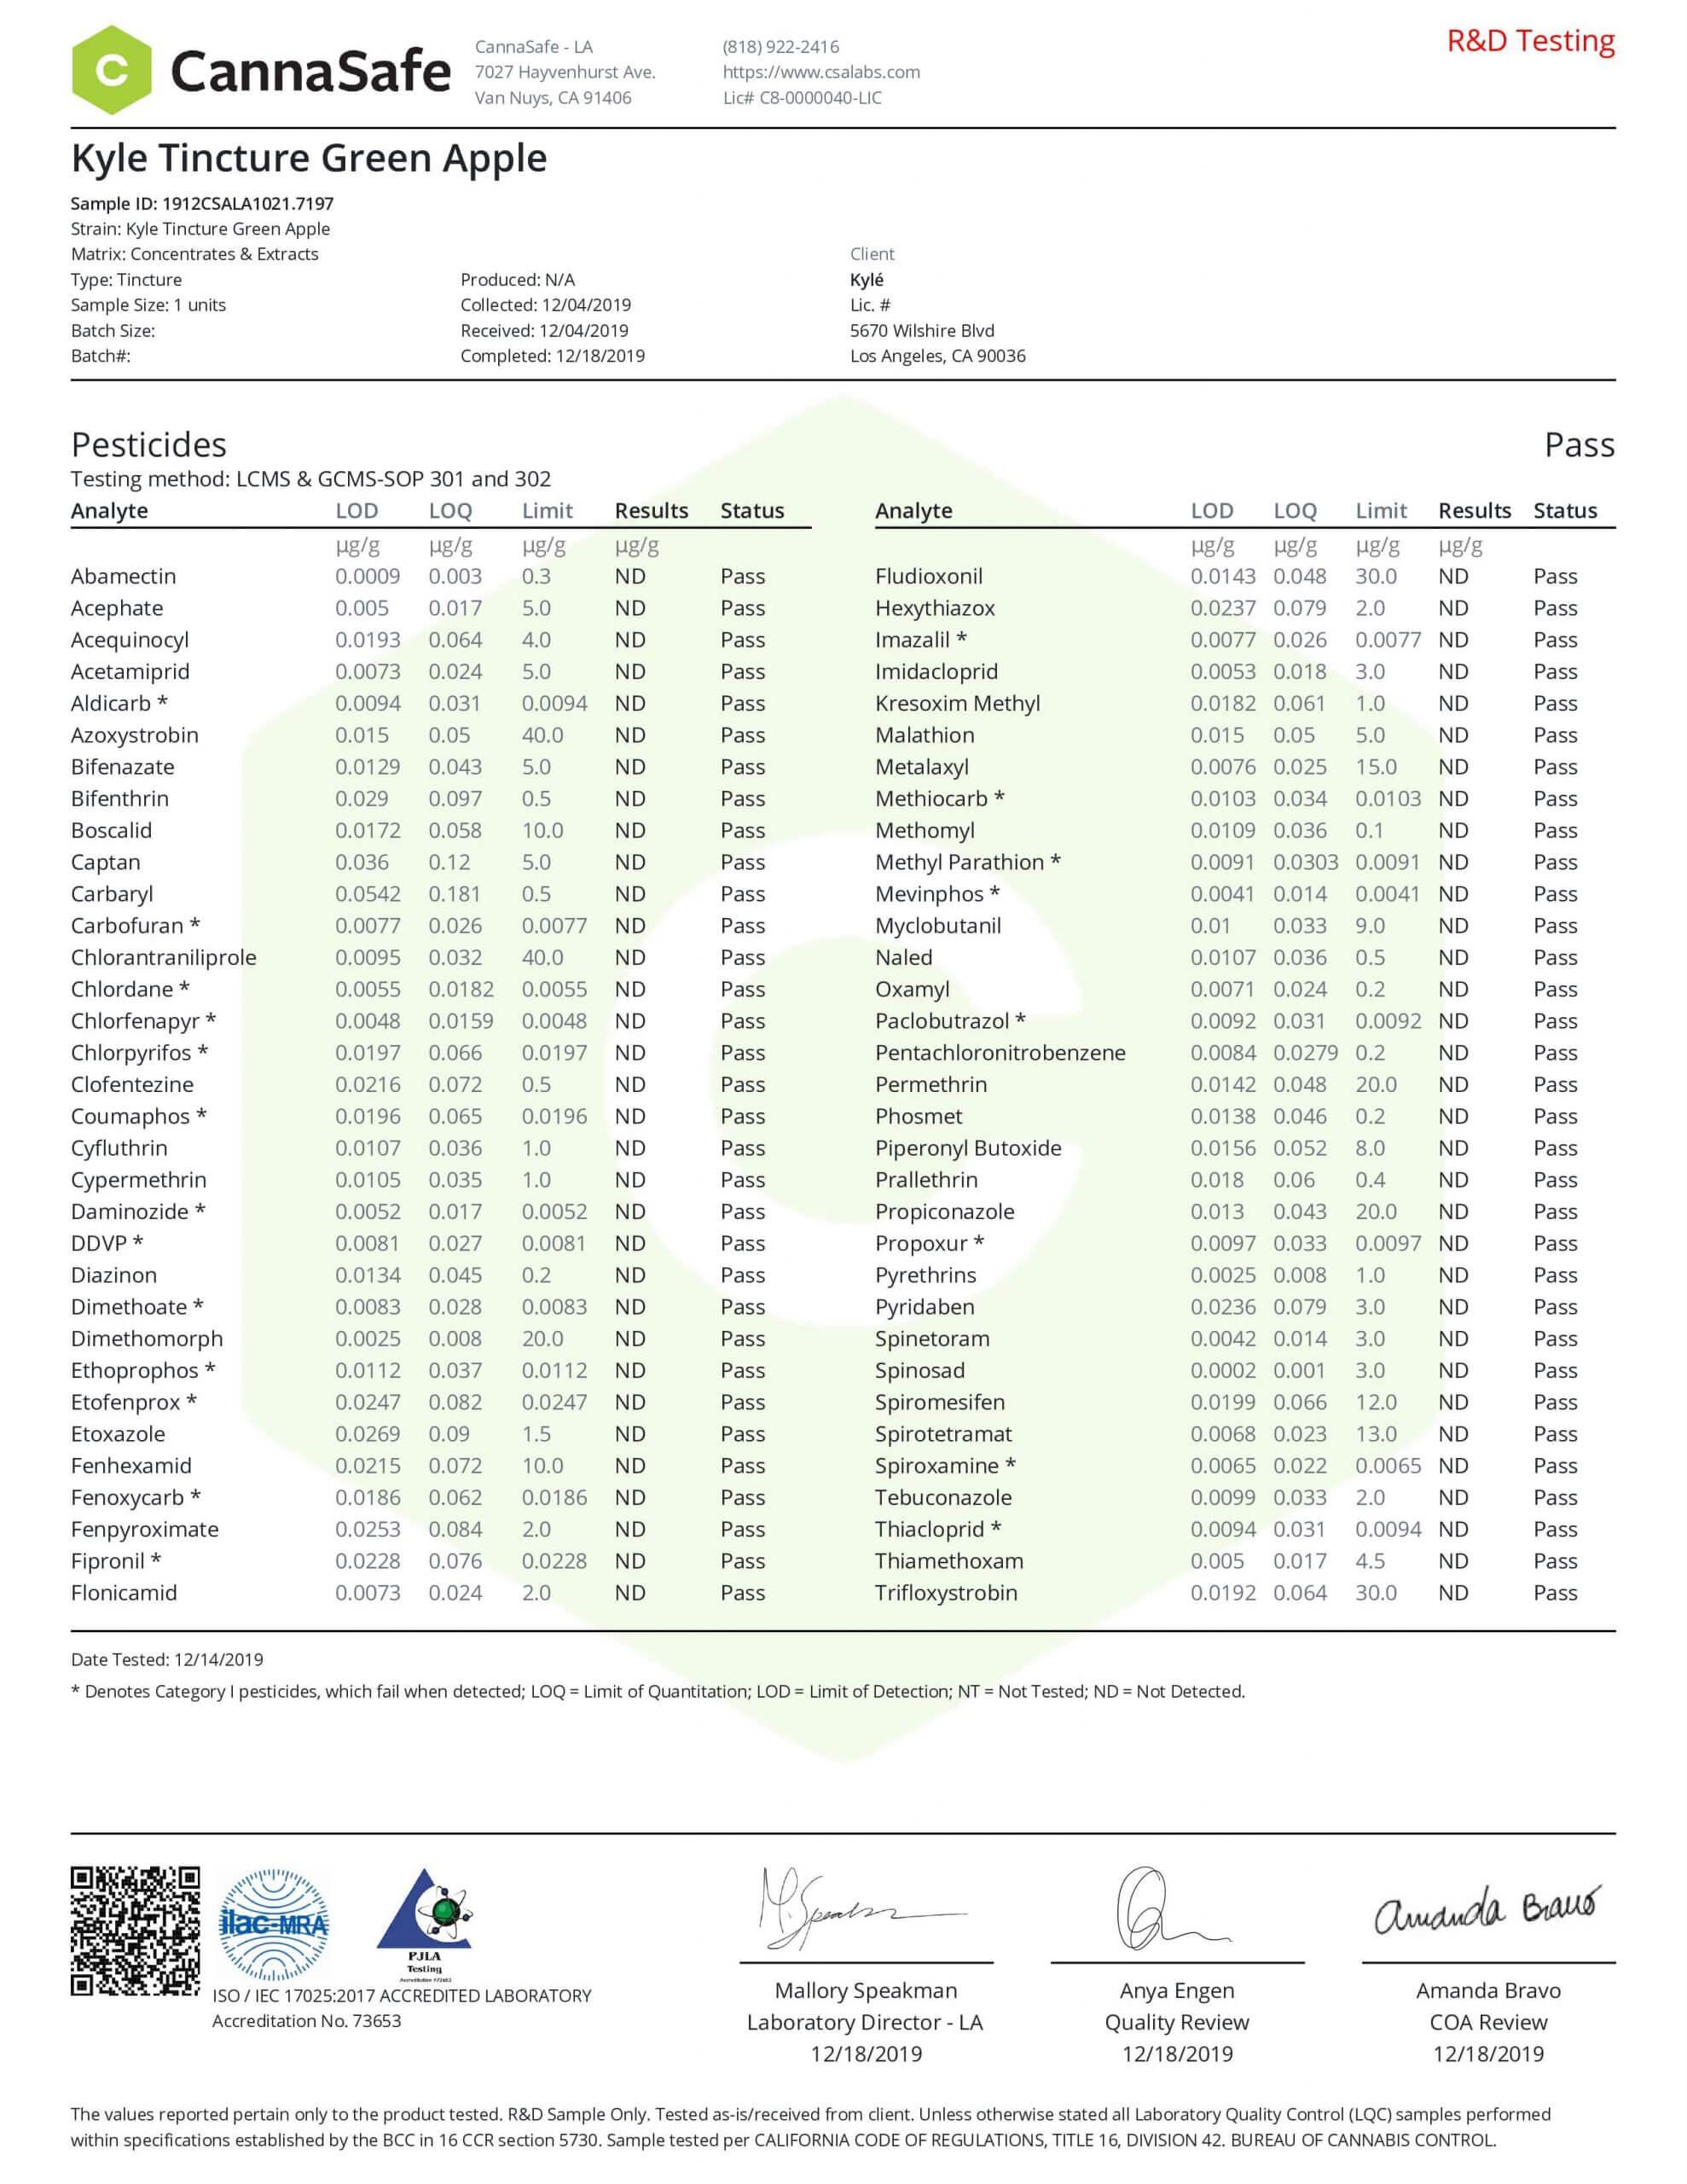 KYLE CBD Gold Green Apple Drop Lab Report Tincture Oil 1000mg